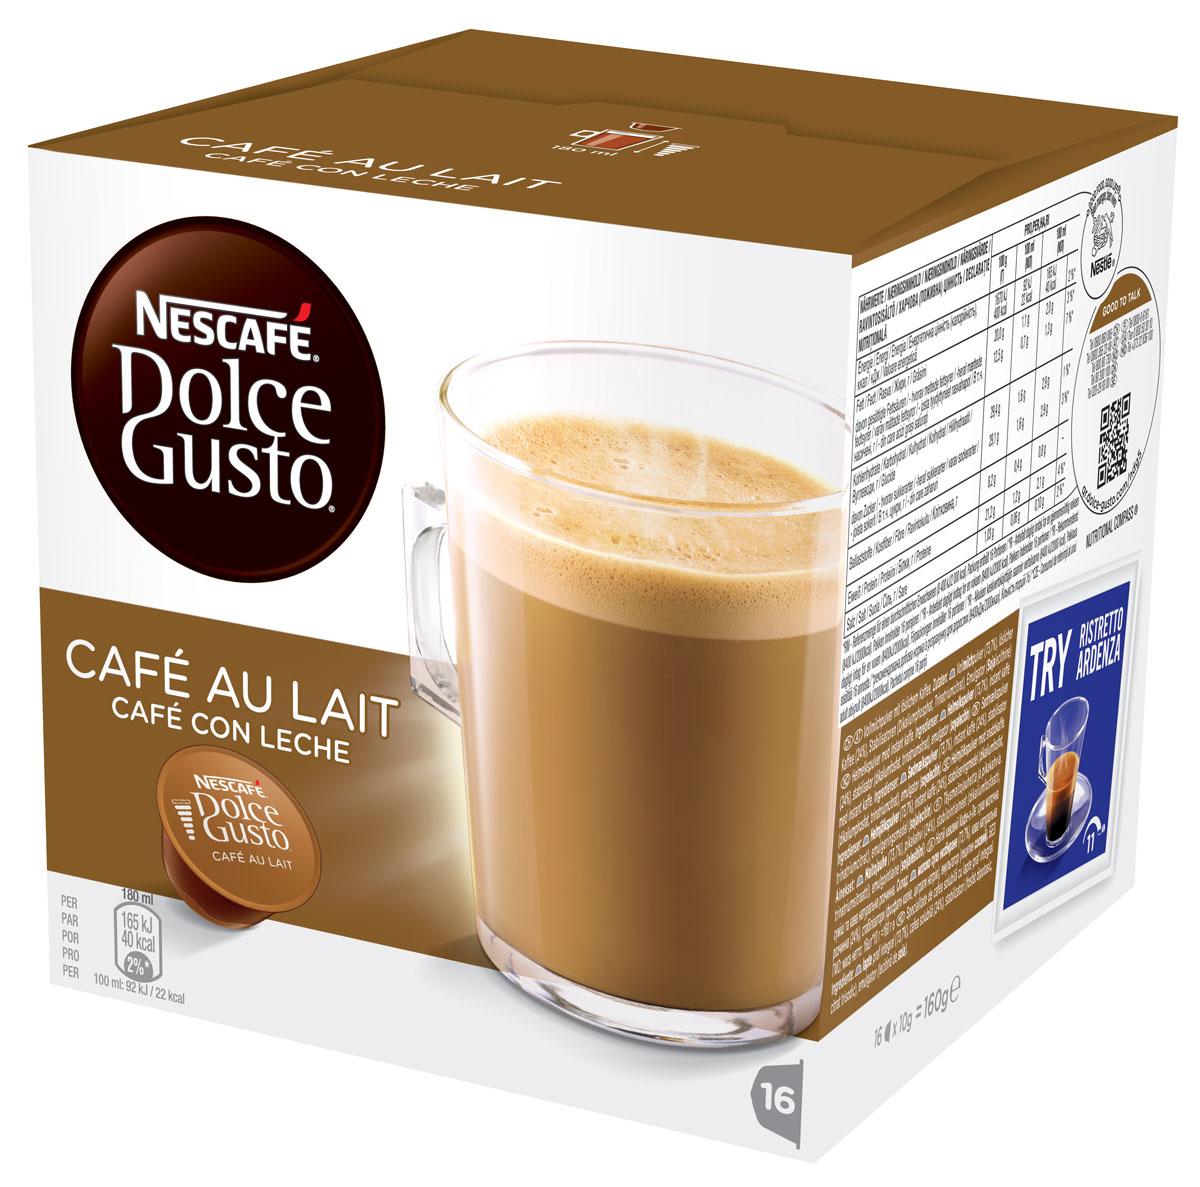 Nescafe Dolce Gusto Кофе О Ле, кофе в капсулах, 16 шт di maestri dolce gusto cappuccio кофе в капсулах 16 шт